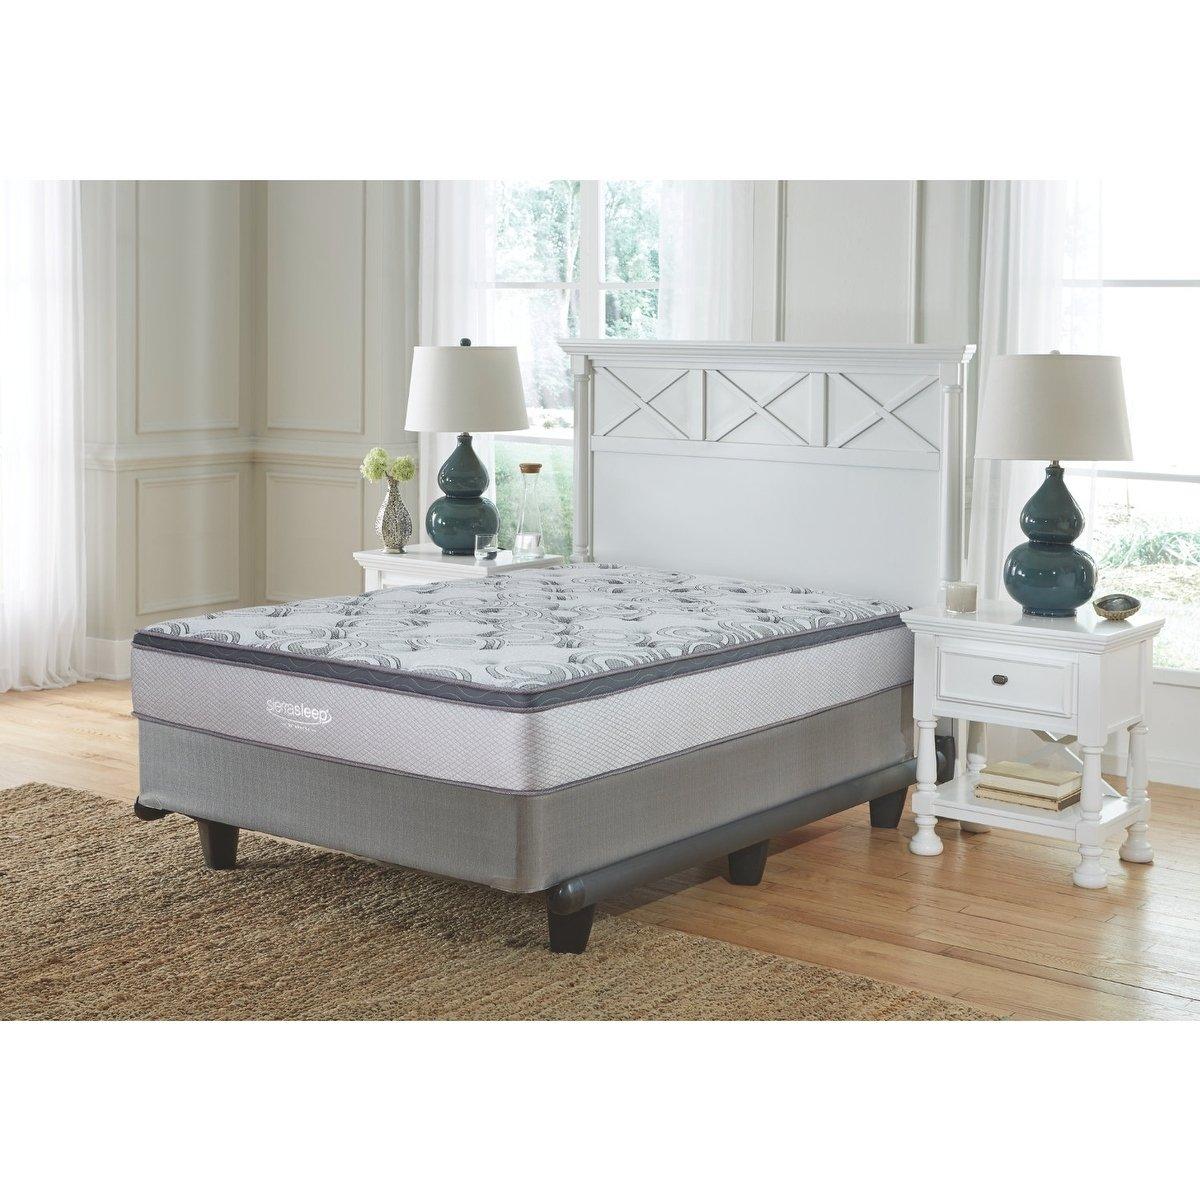 Fall Into Award Winning Comfort Discount Bedroom Furniture